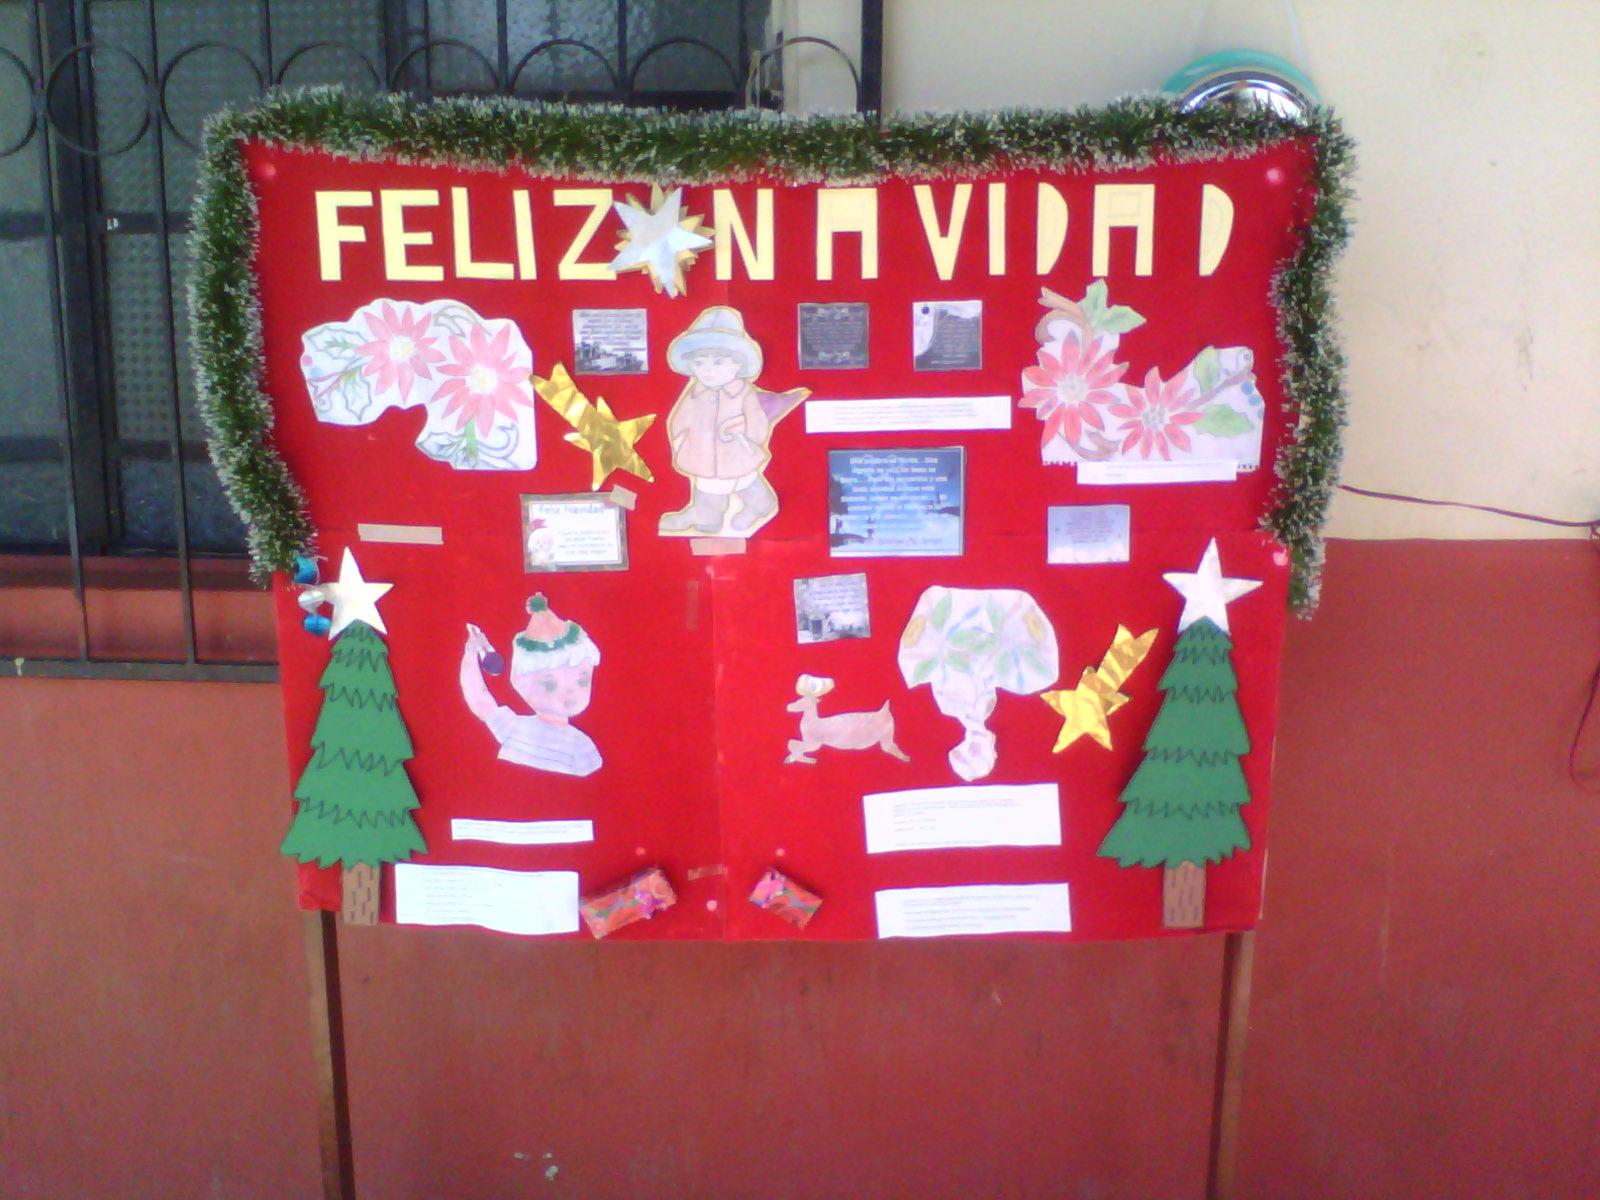 Periodico mural navideno escuela secundaria diurna 82 for Mural navideno